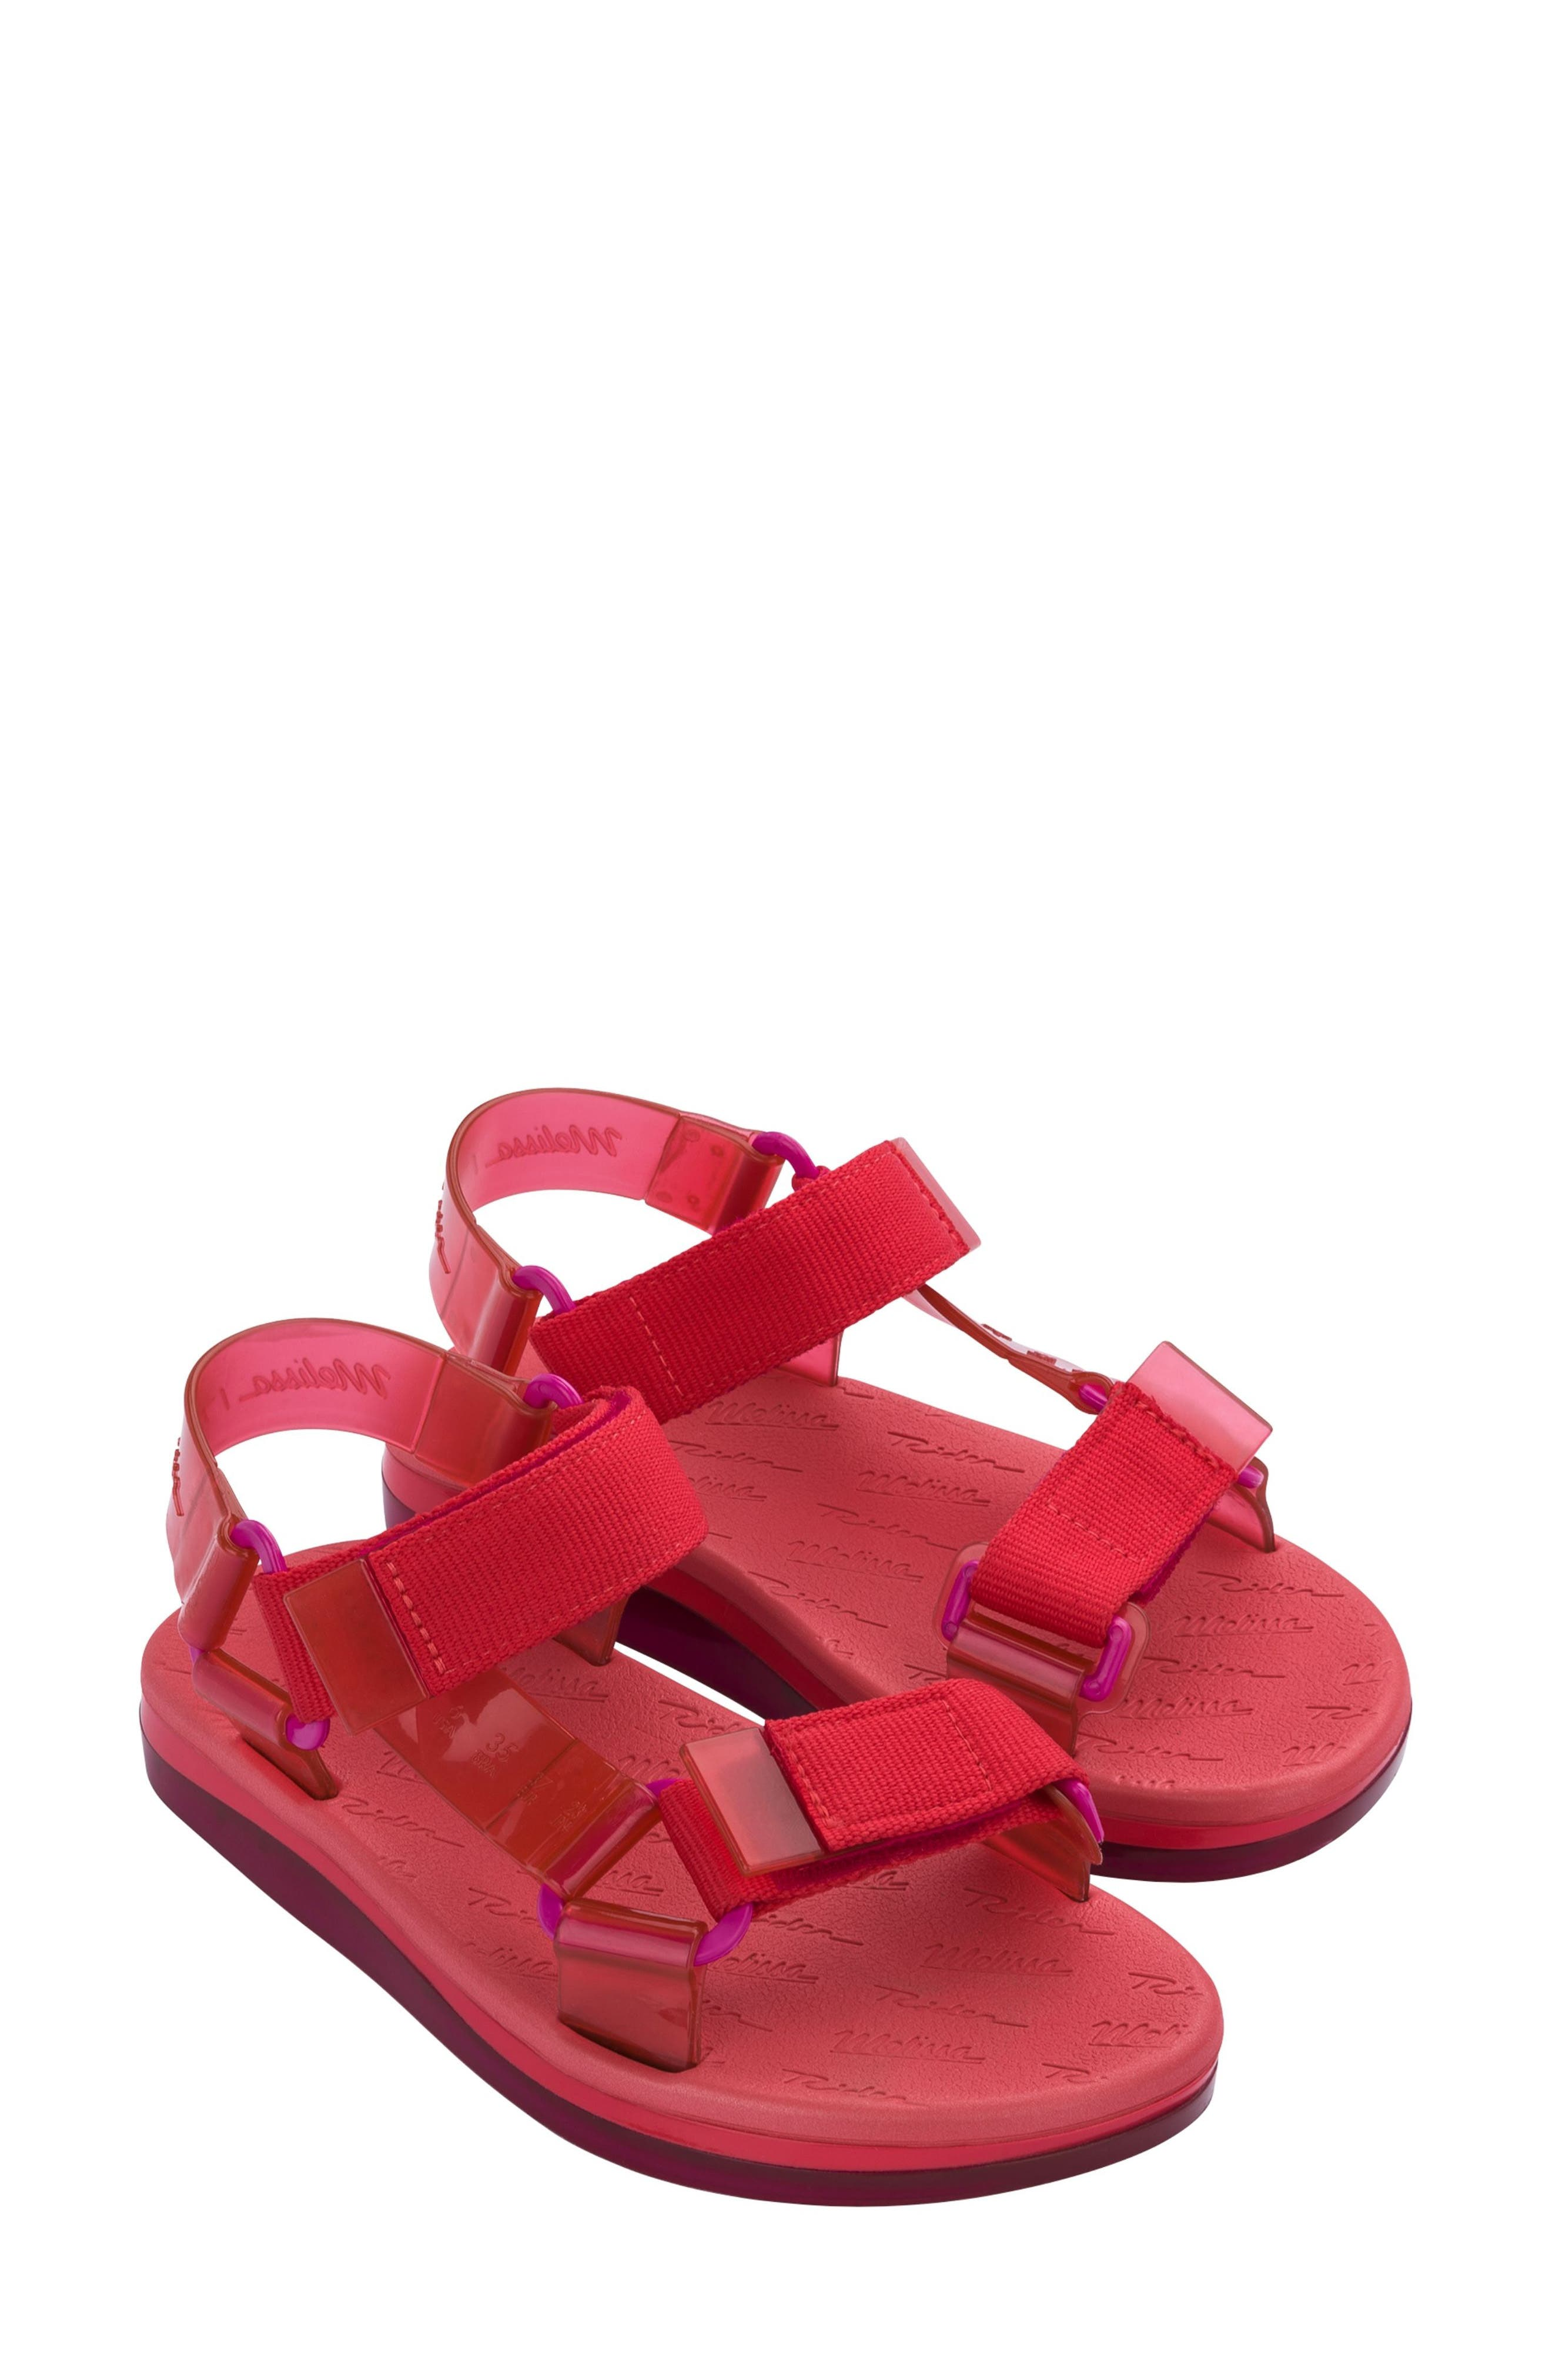 Papete Rider Sandal